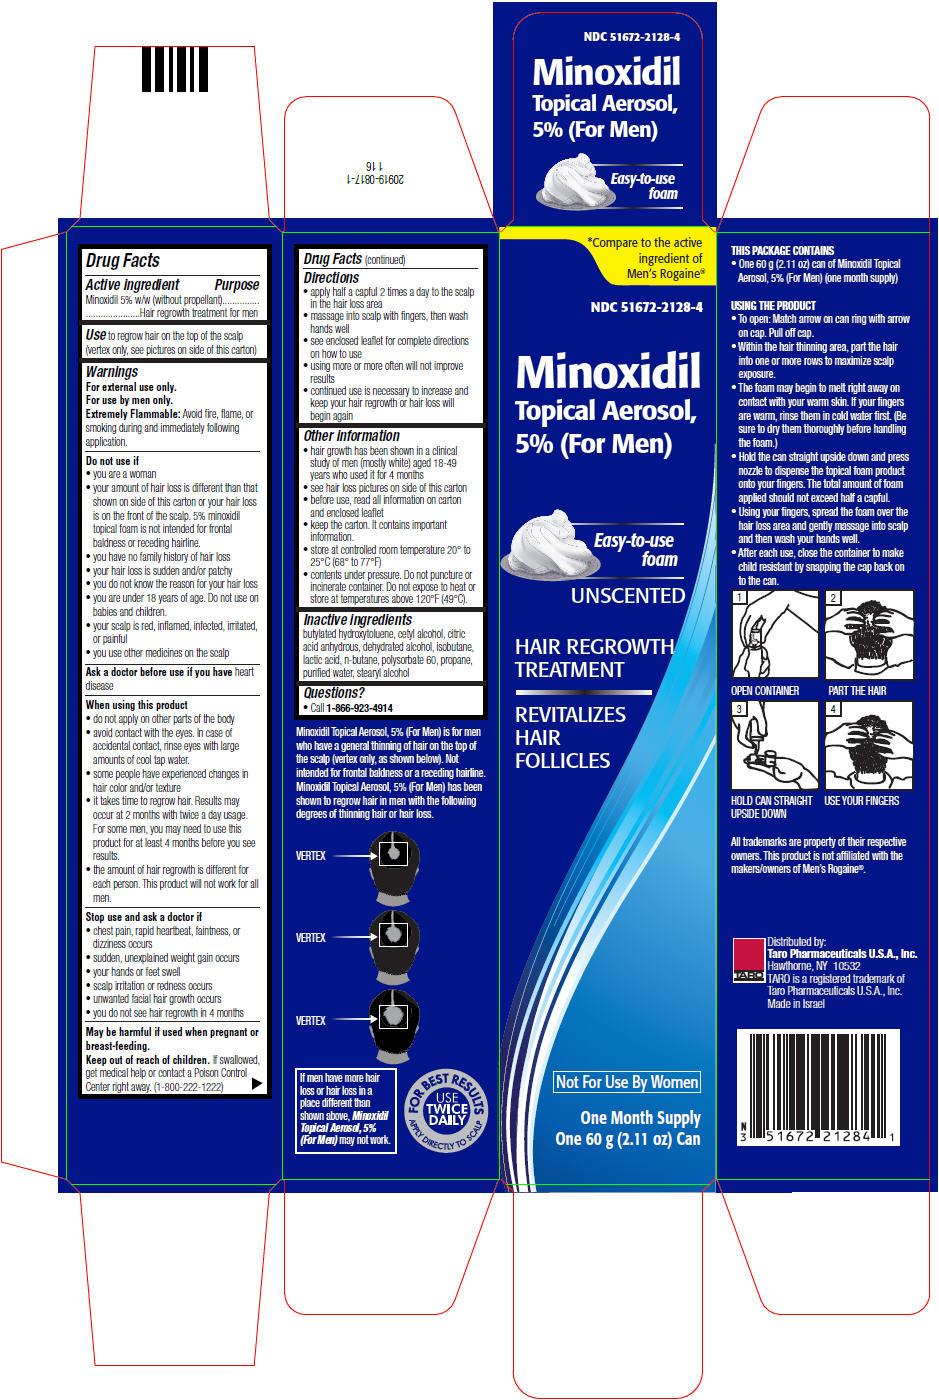 Principal Display Panel - 60 g Can Package